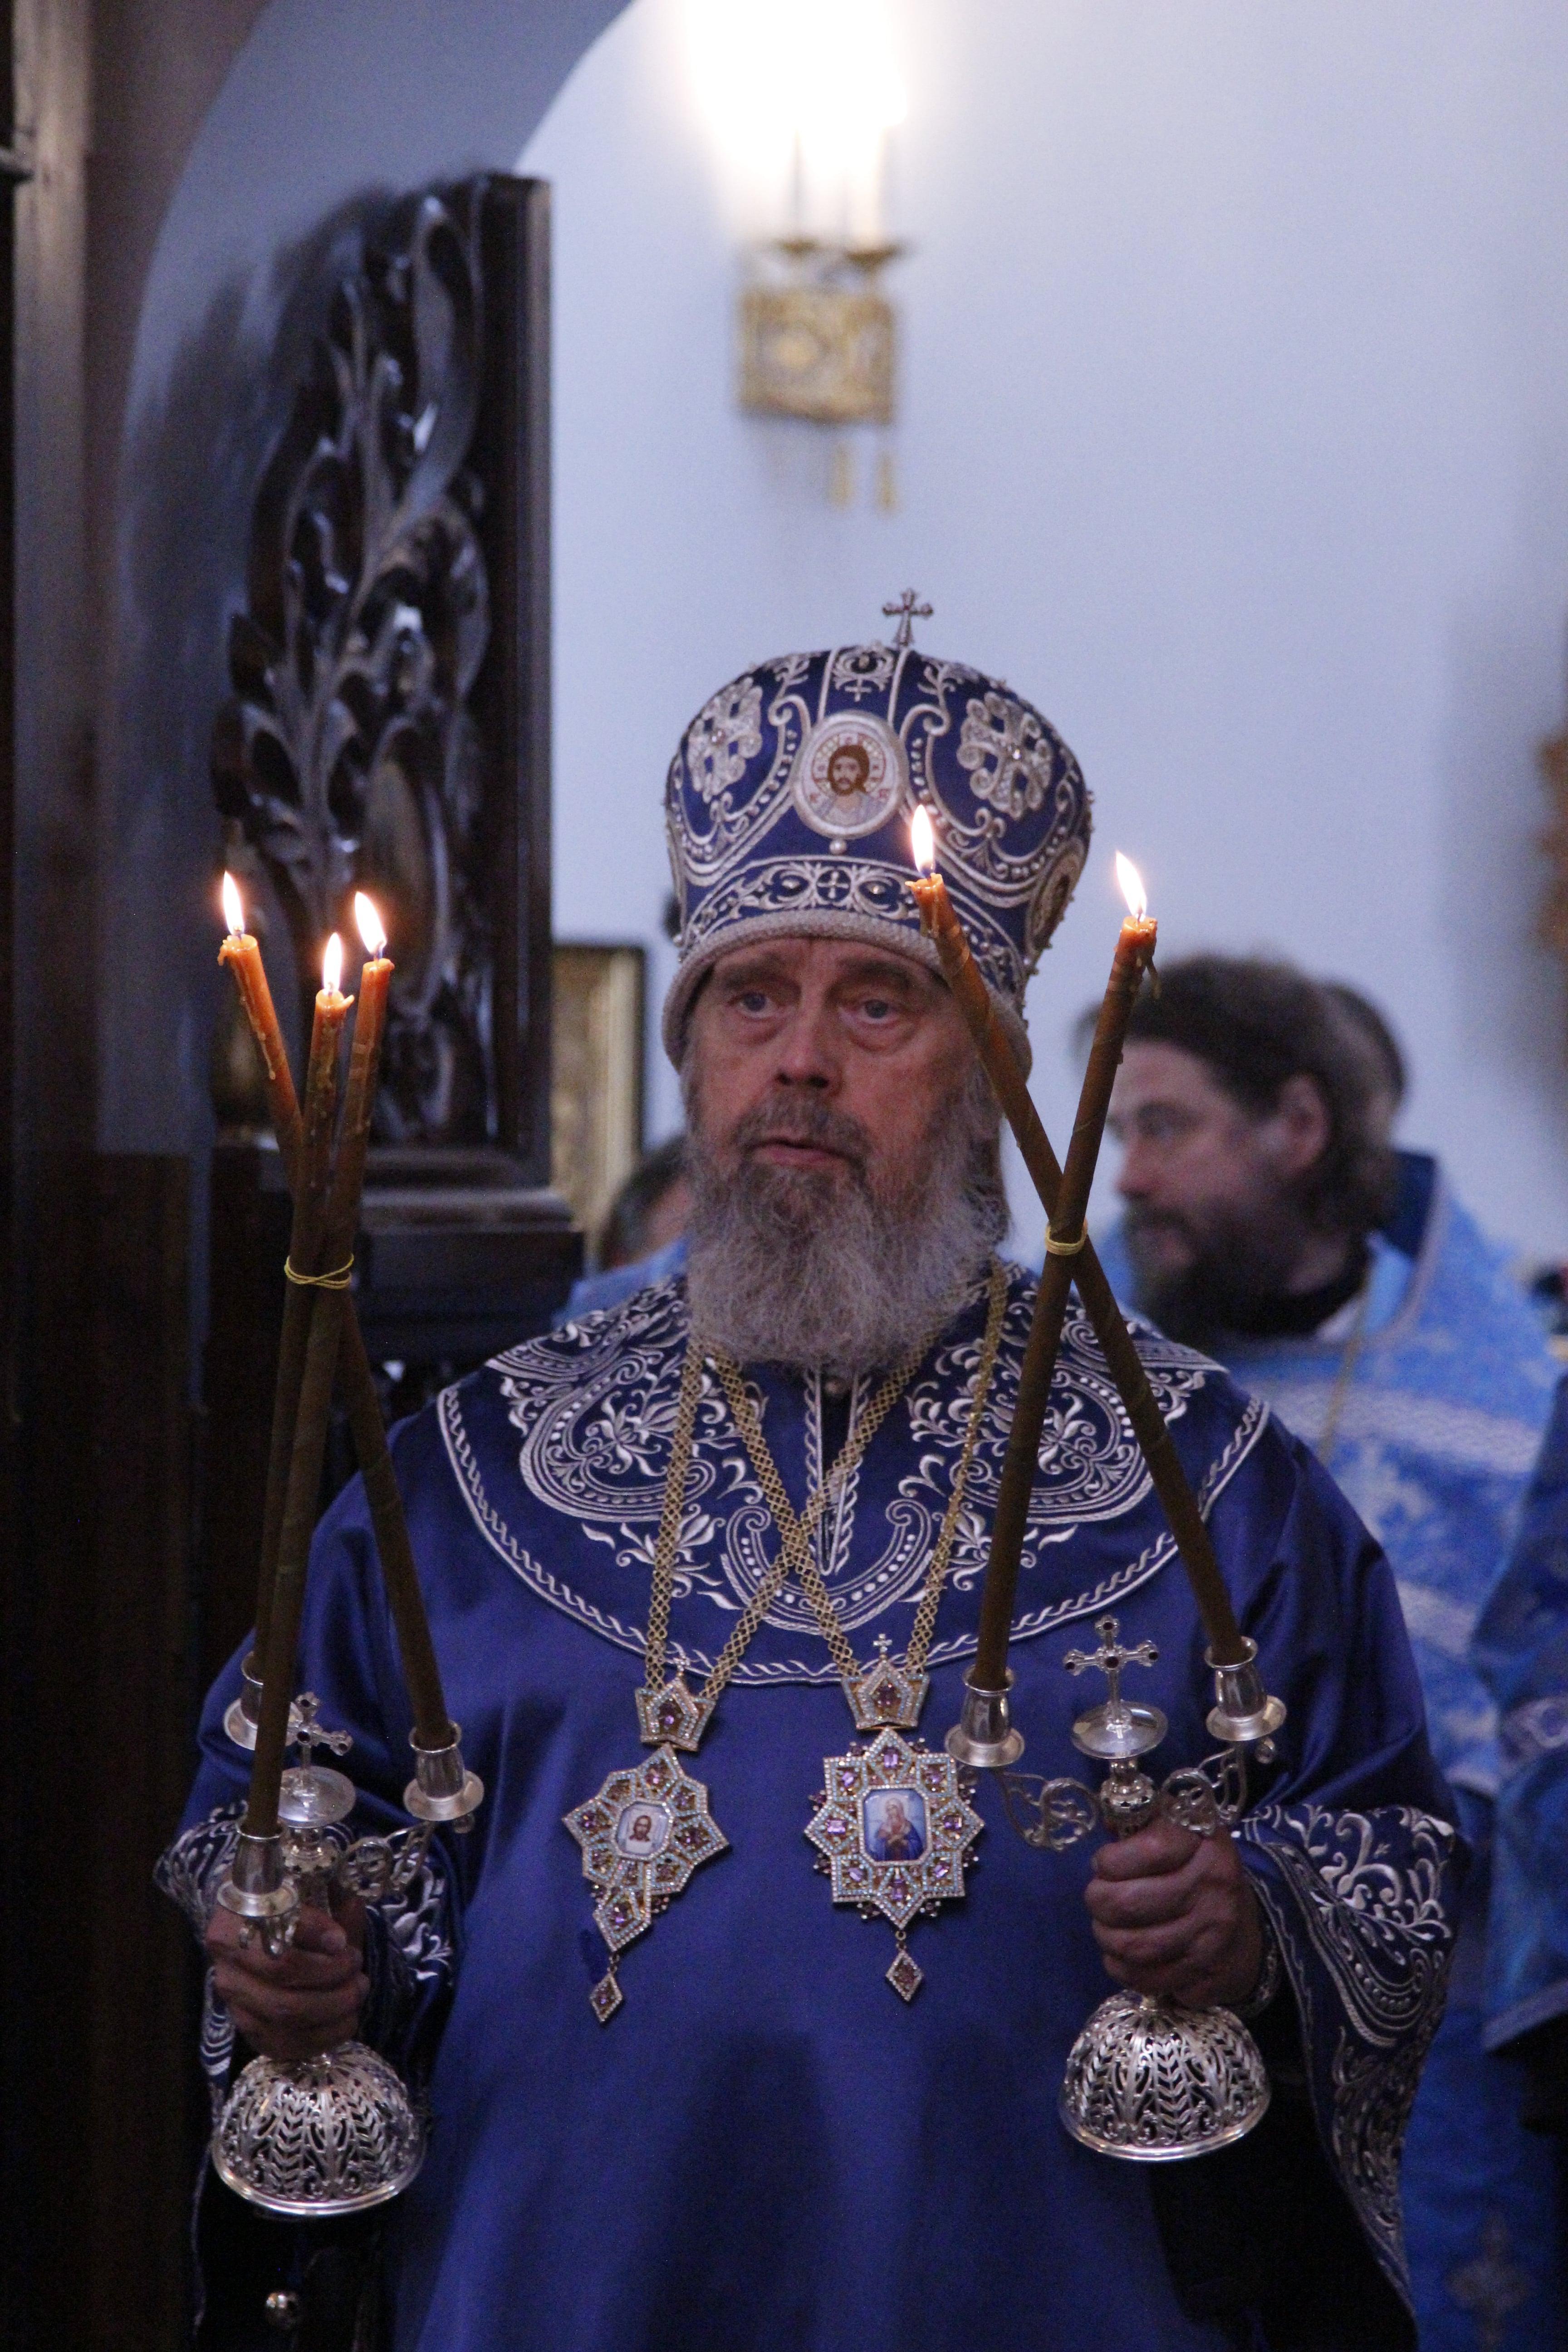 http://monuspen.ru/photoreports/4c37fc6d4cfa44c3ade52cad0af9c478.JPG